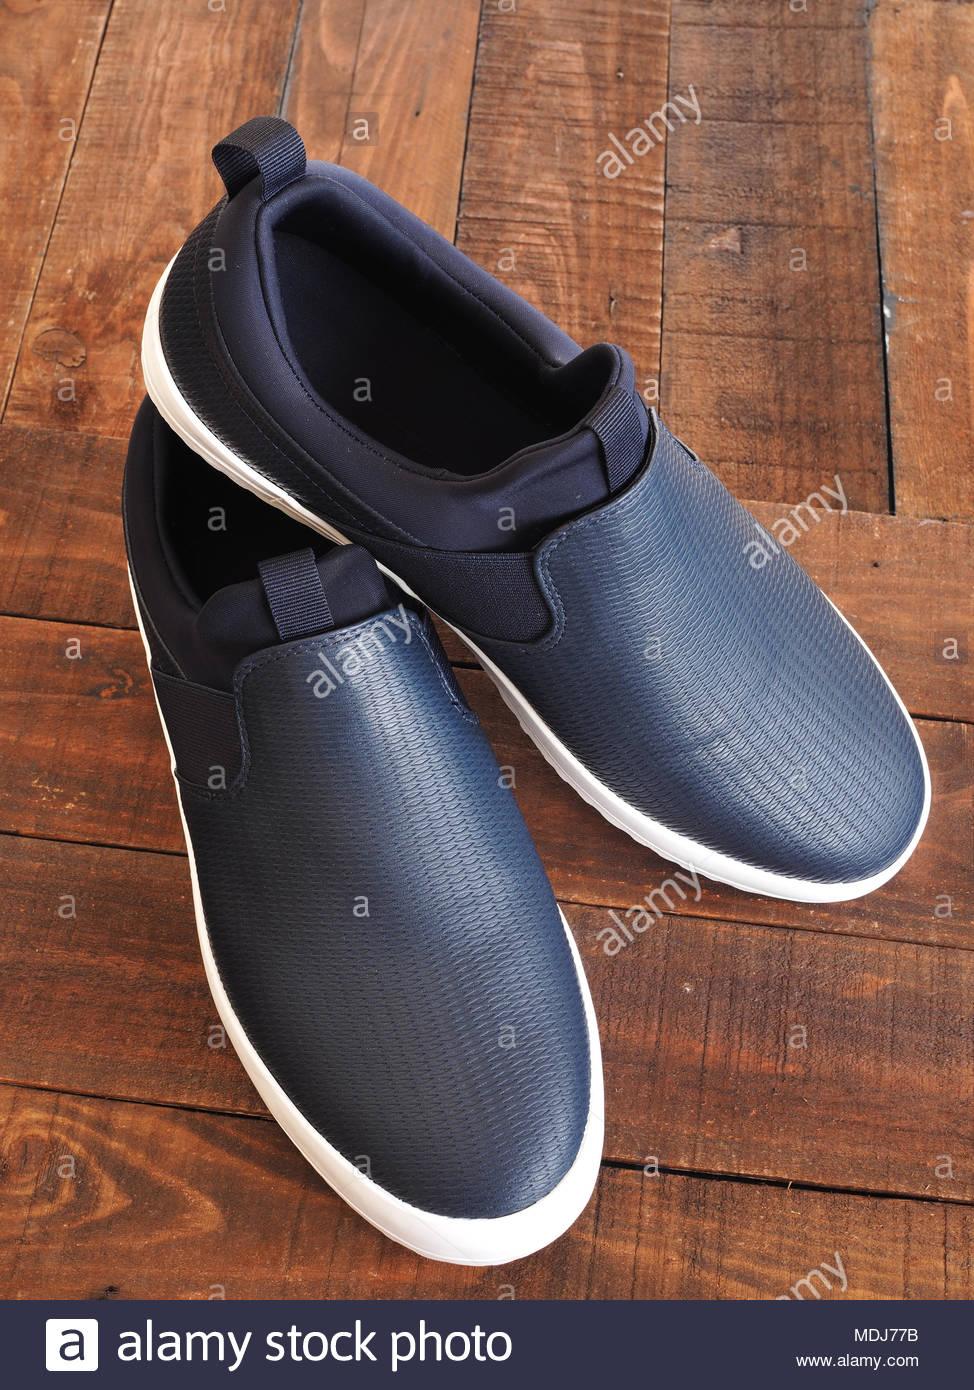 Men's dark blue slip on casual shoes